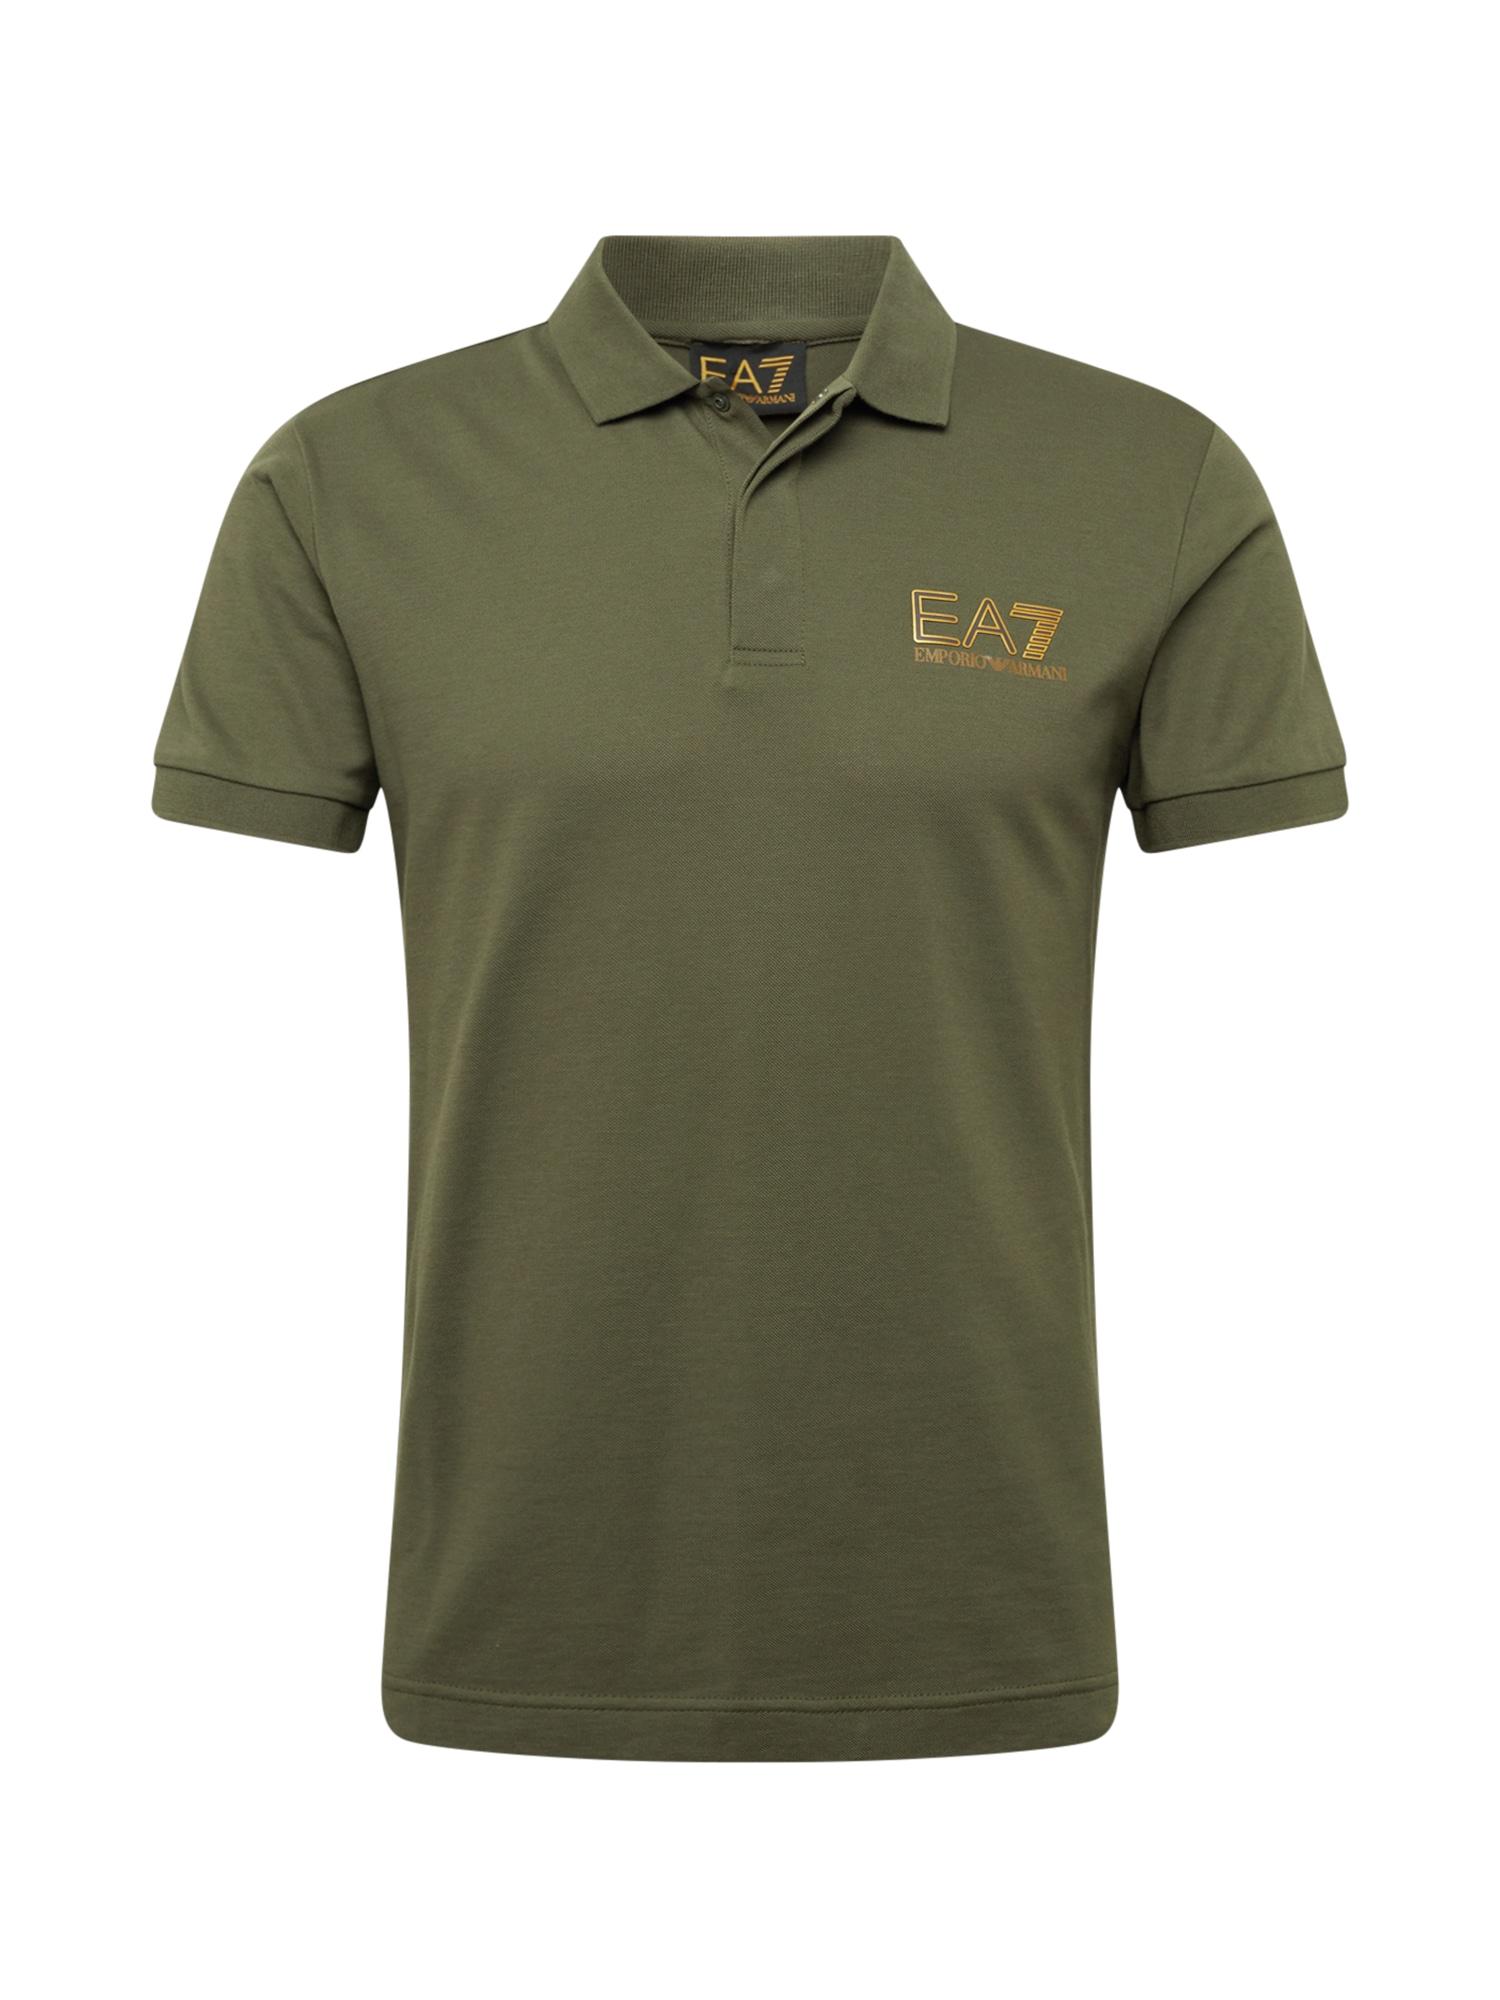 EA7 Emporio Armani Marškinėliai žalia / auksas